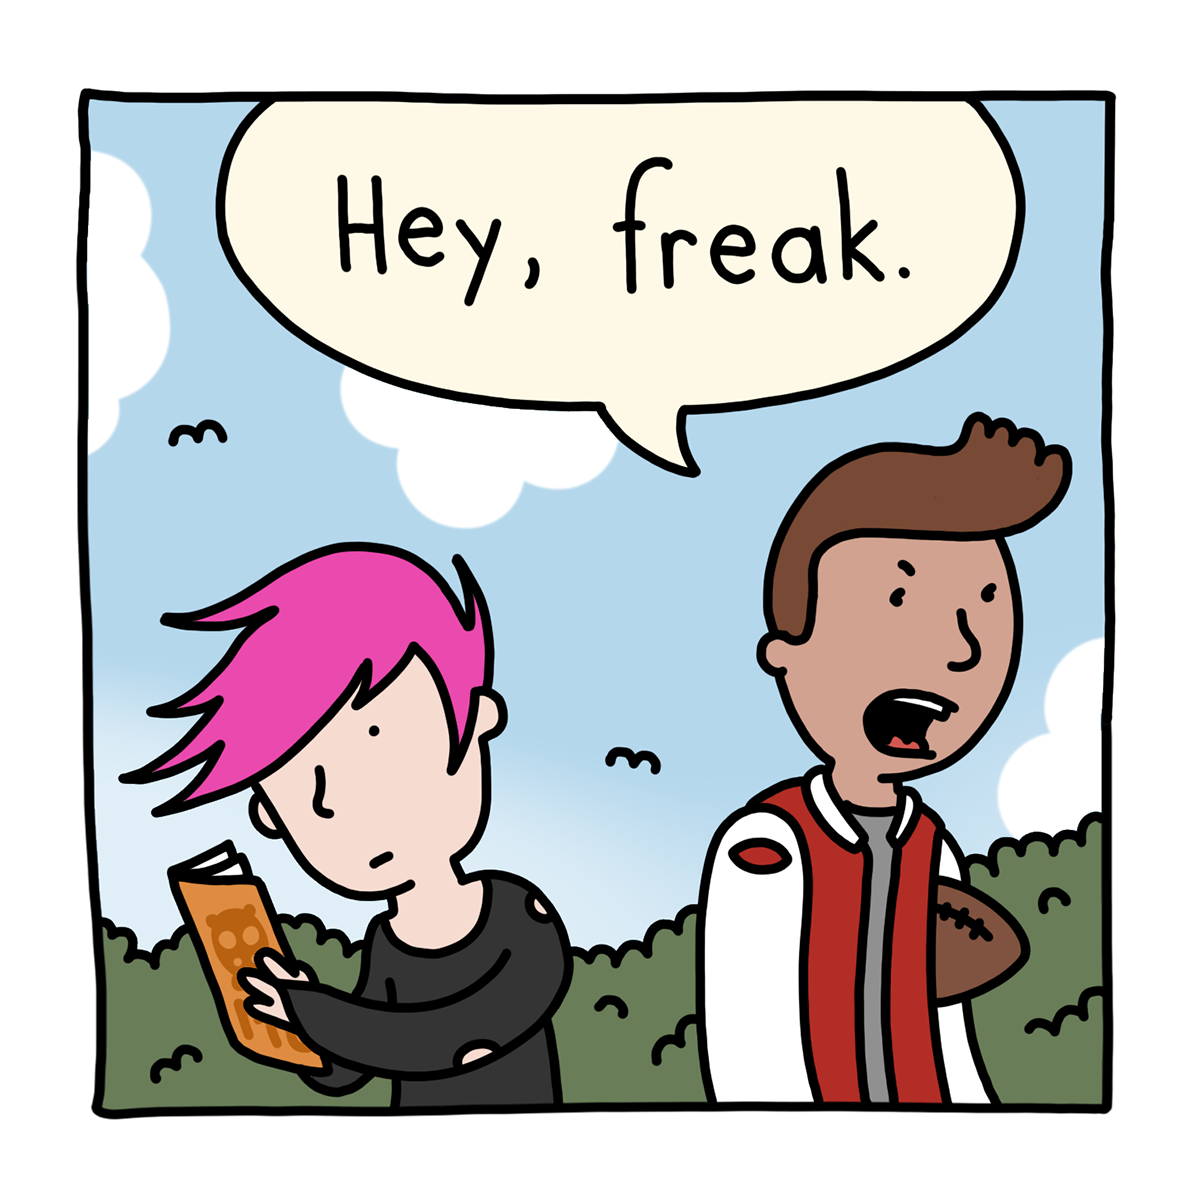 freak1.png